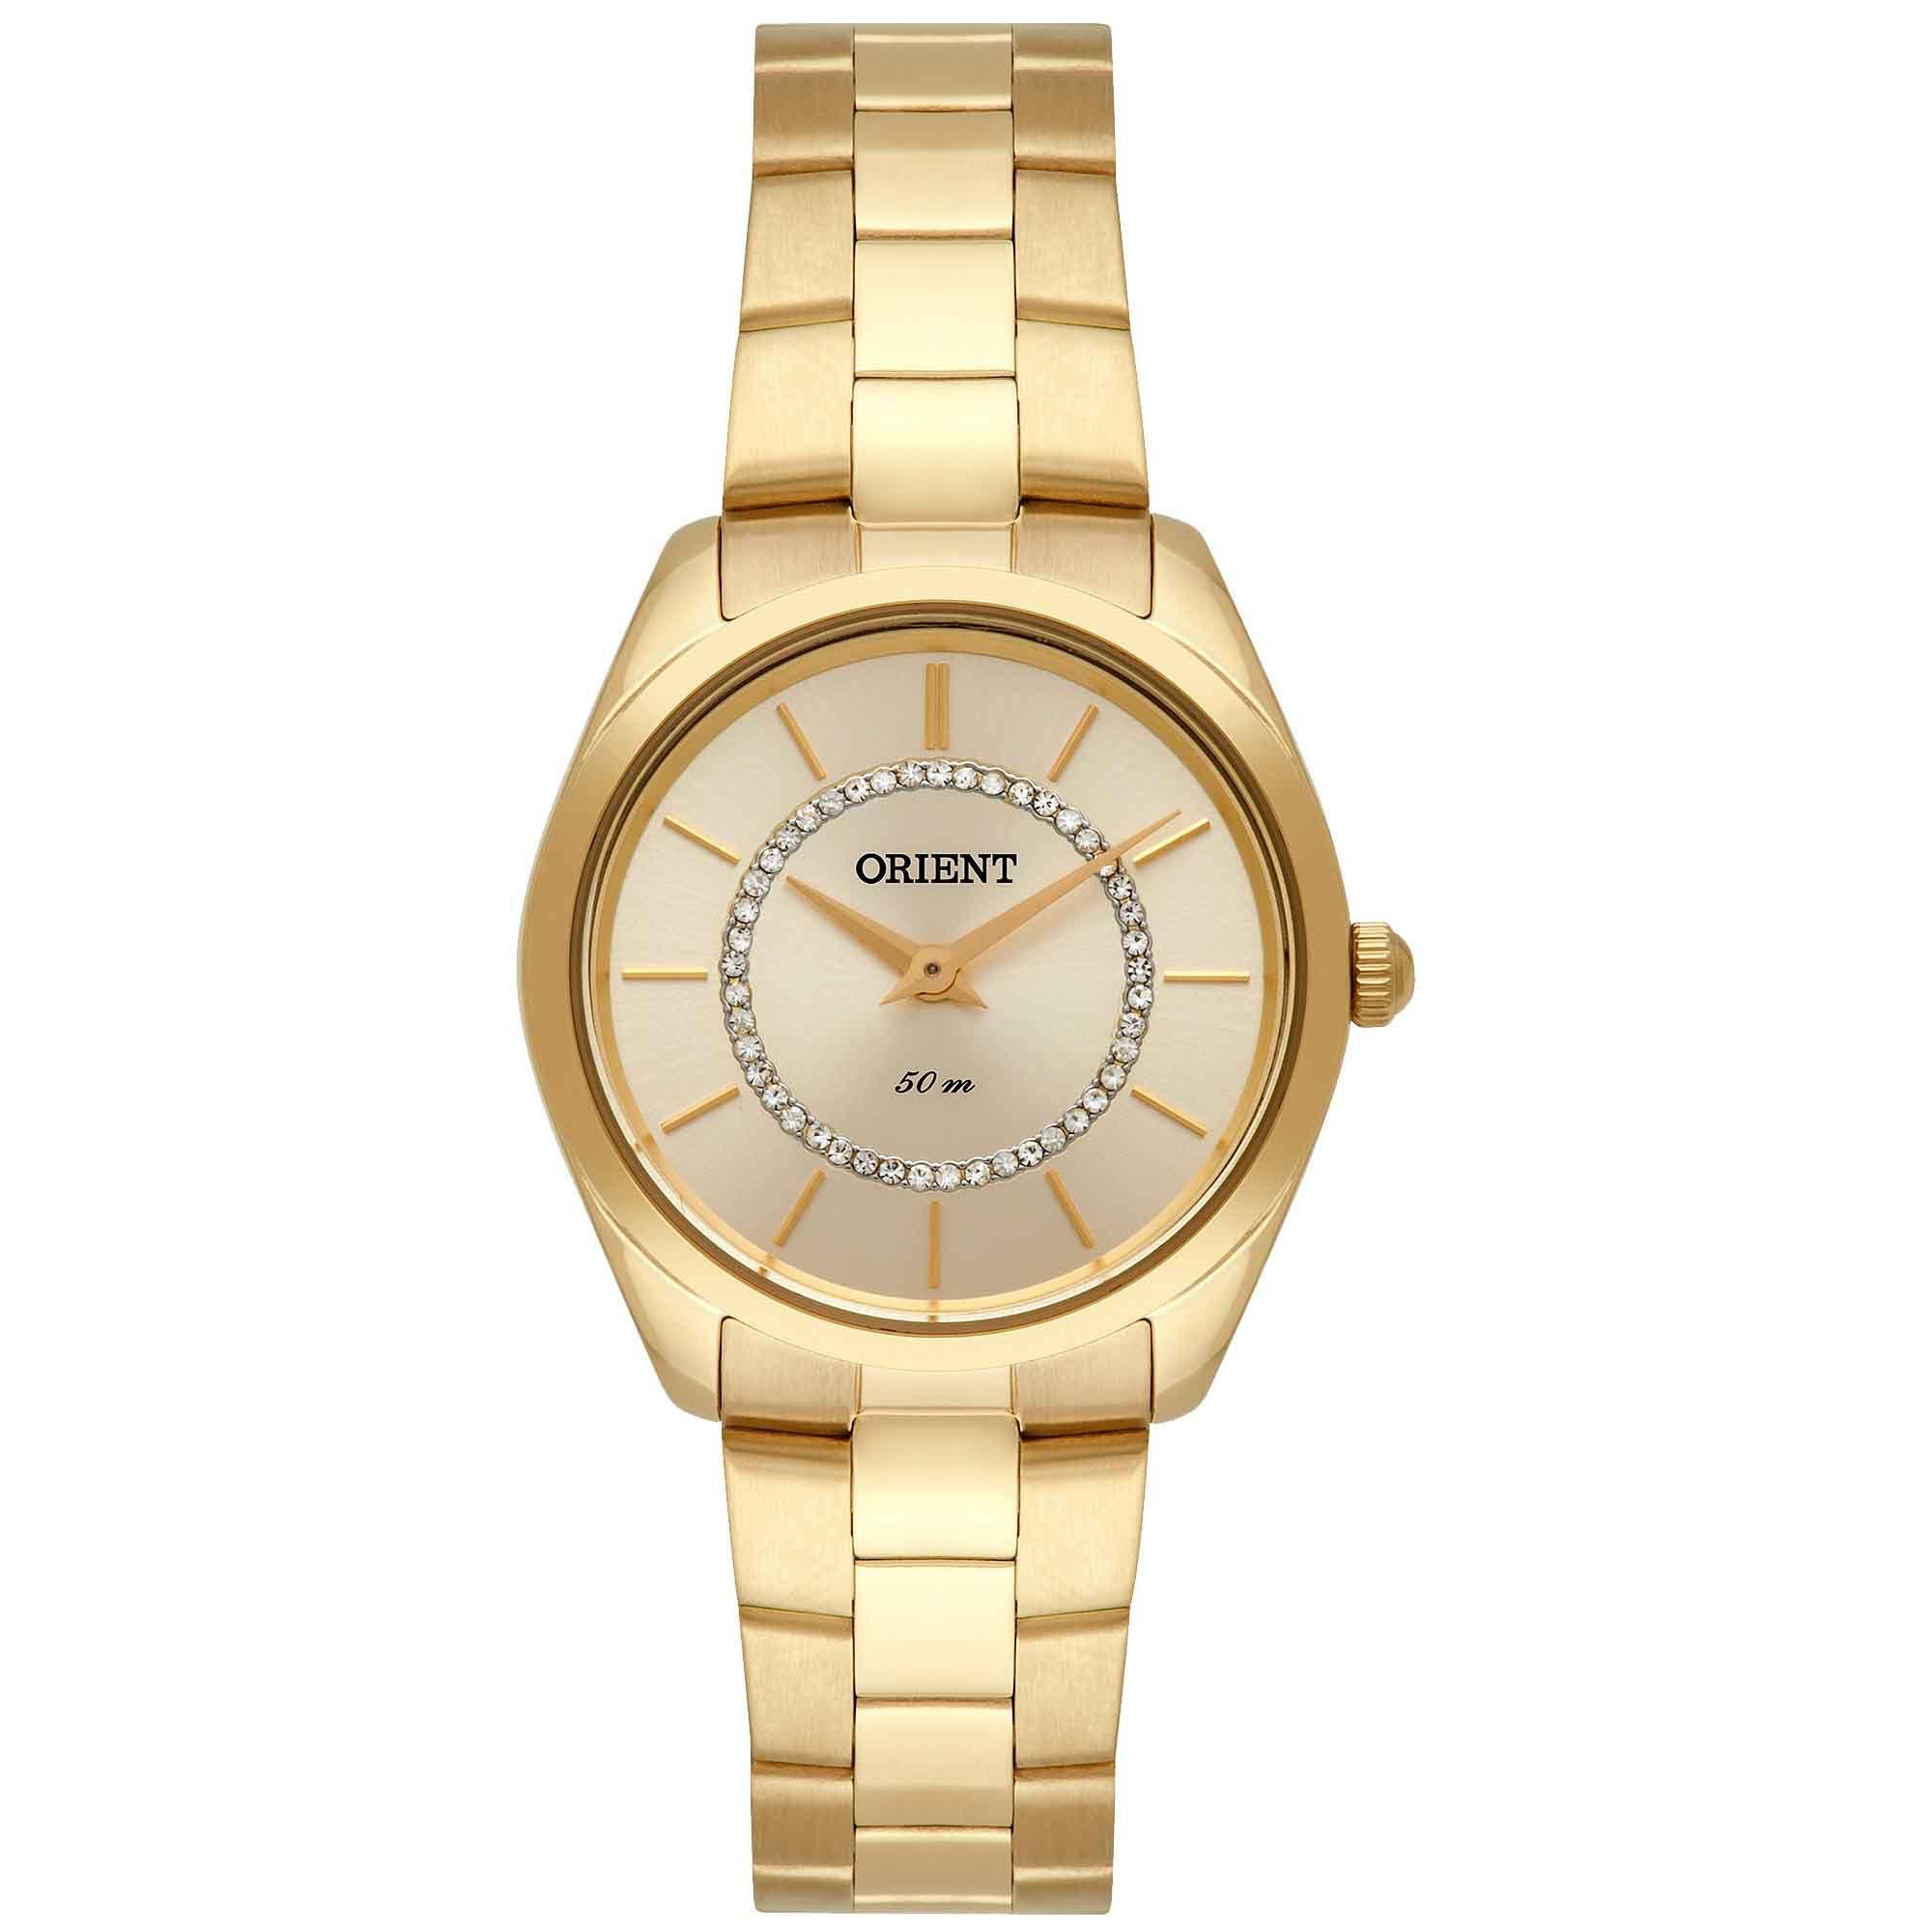 Relógio Feminino Orient FGSS0125 C1KX